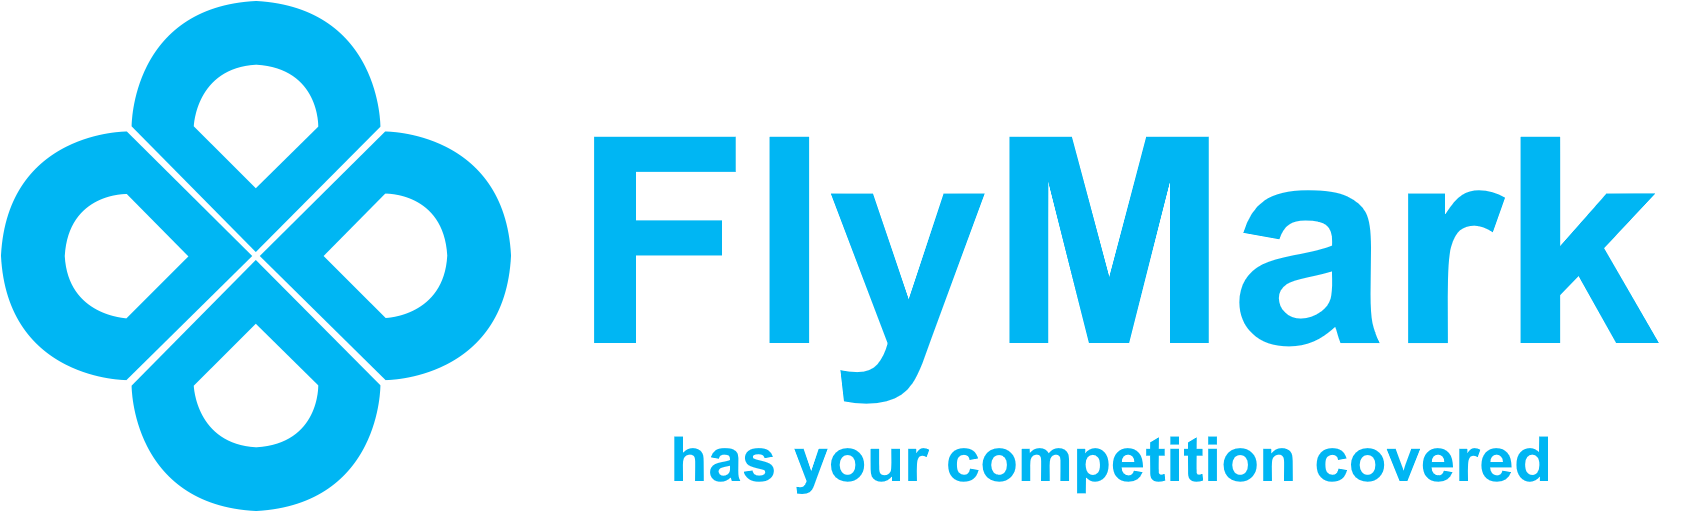 FlyMark_1